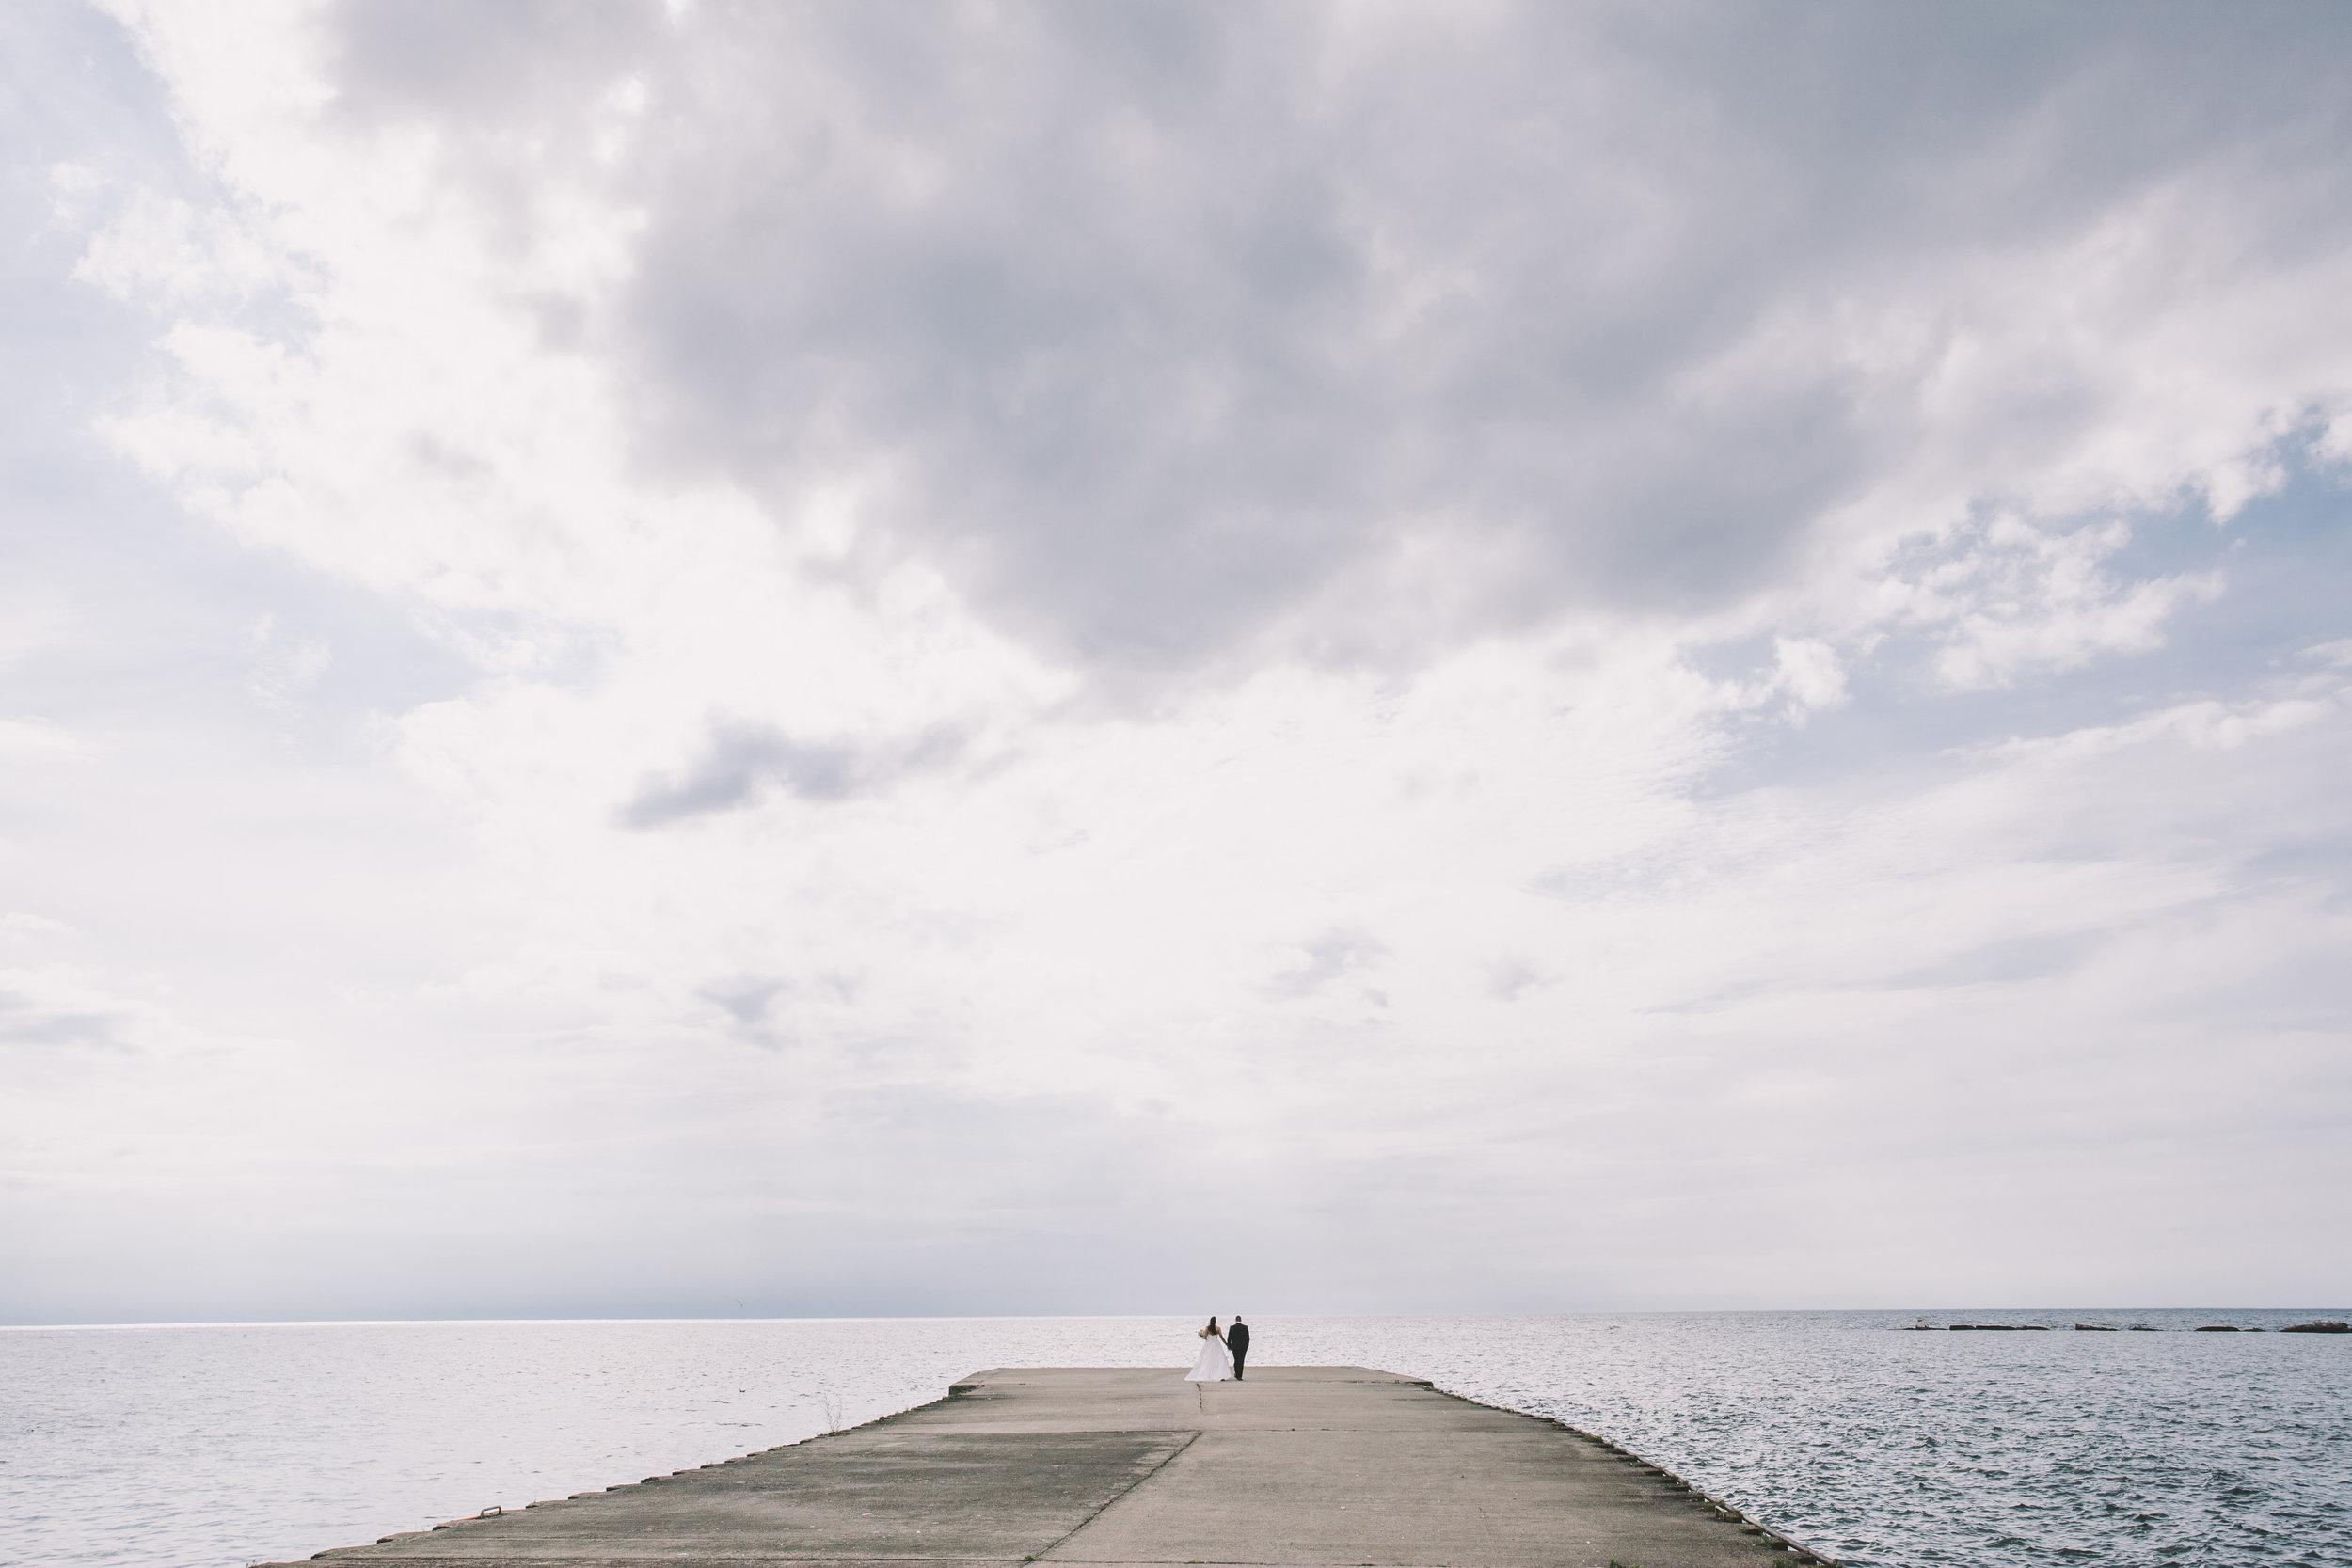 Wedding couple walking on the Kincardine pier.